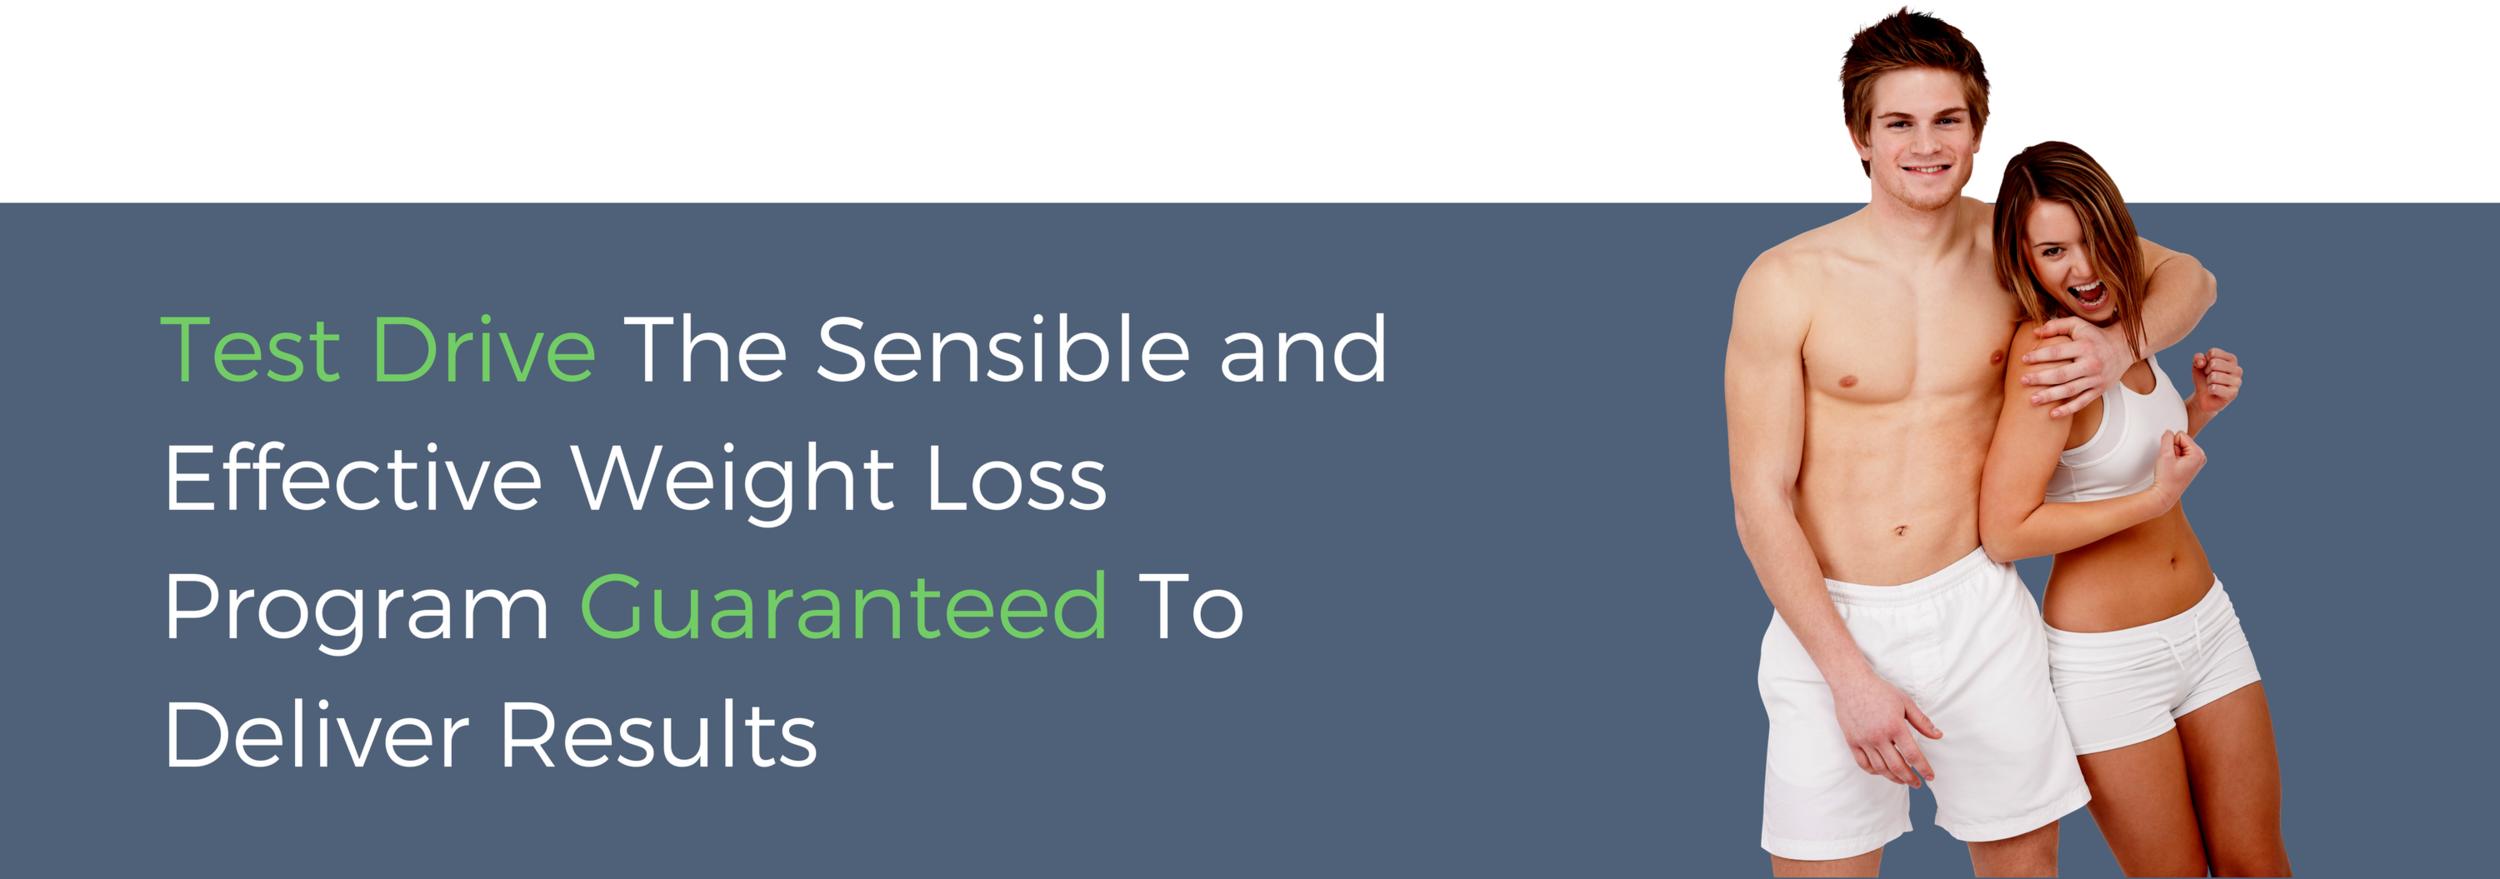 Sensible weight loss program